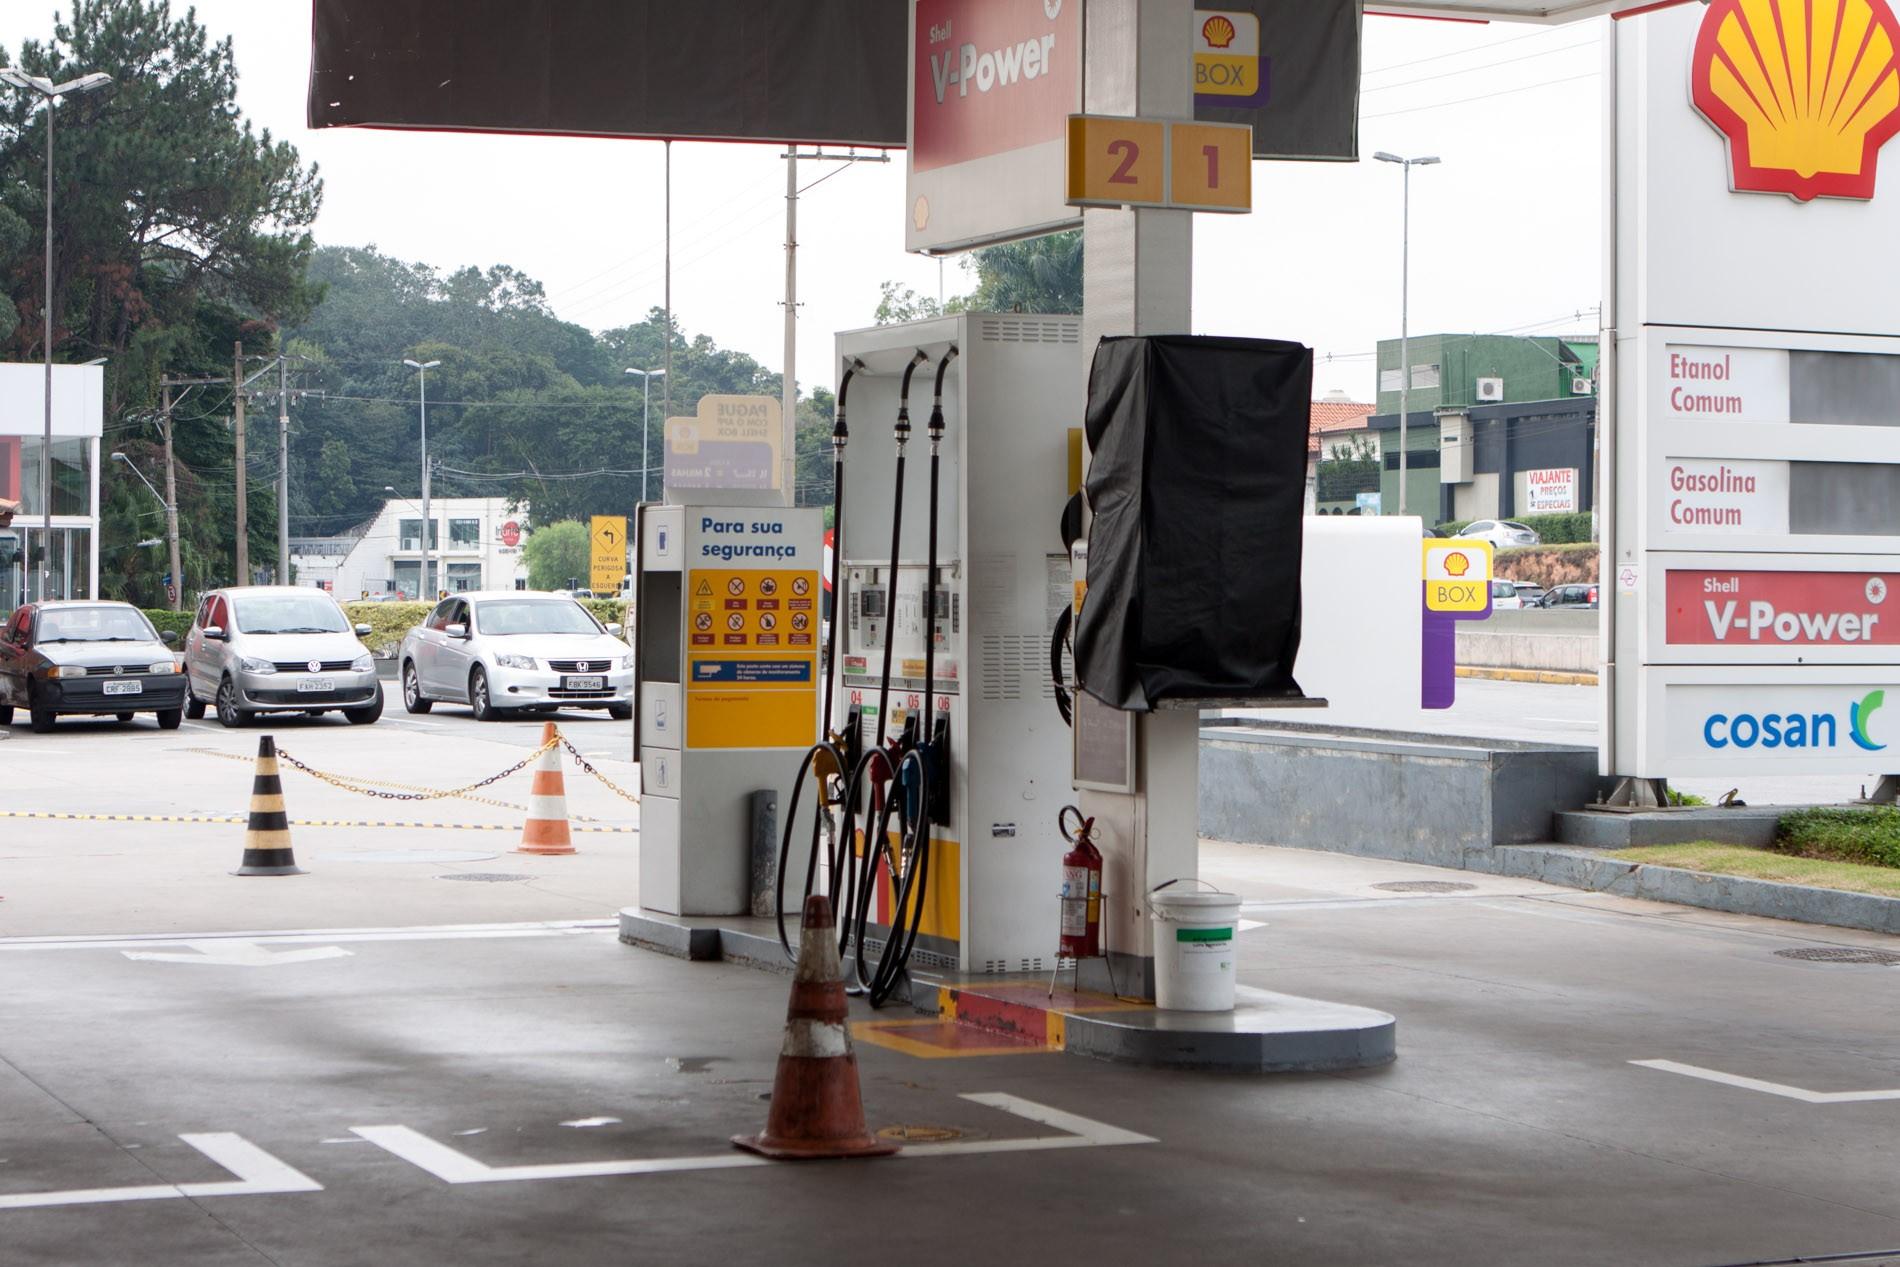 Procon Aracaju disponibiliza nova pesquisa comparativa de preços dos combustíveis